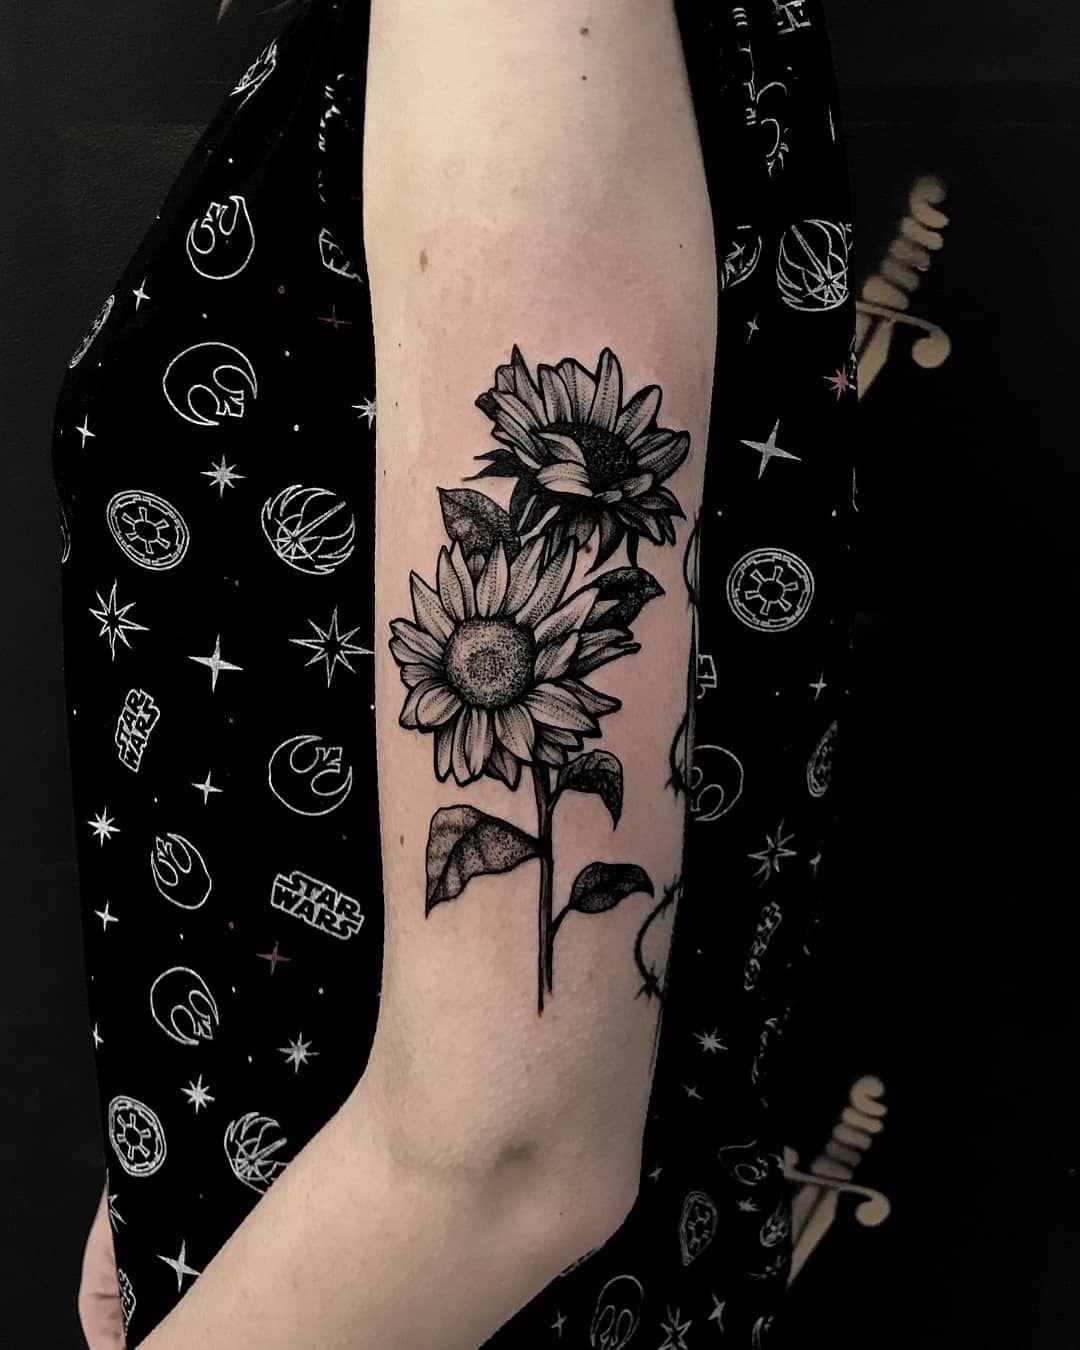 Black tattoo cover up ideas pin by kaitlyn hboubati on tattoos  pinterest  tattoos little